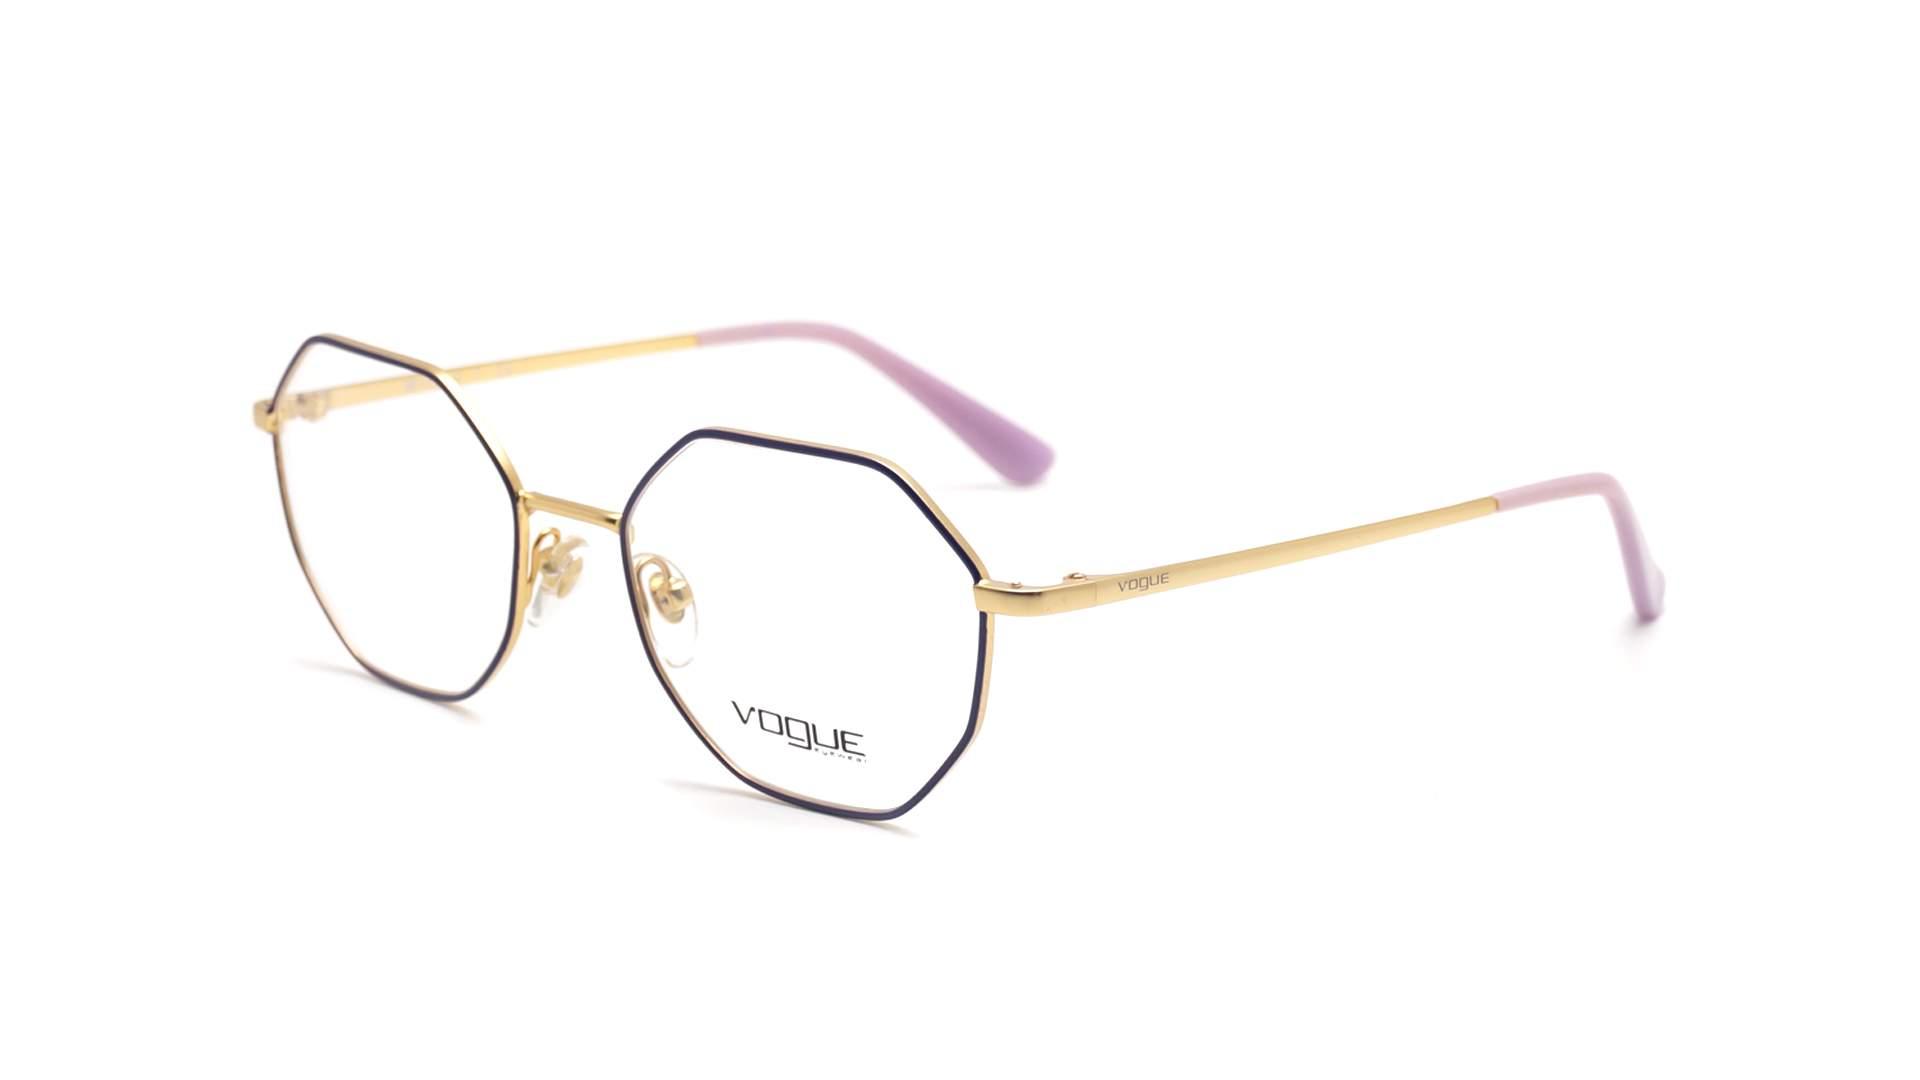 6bb2b90dca5 Lunettes de vue Vogue VO4094 5091 50-18 Multicolore Medium